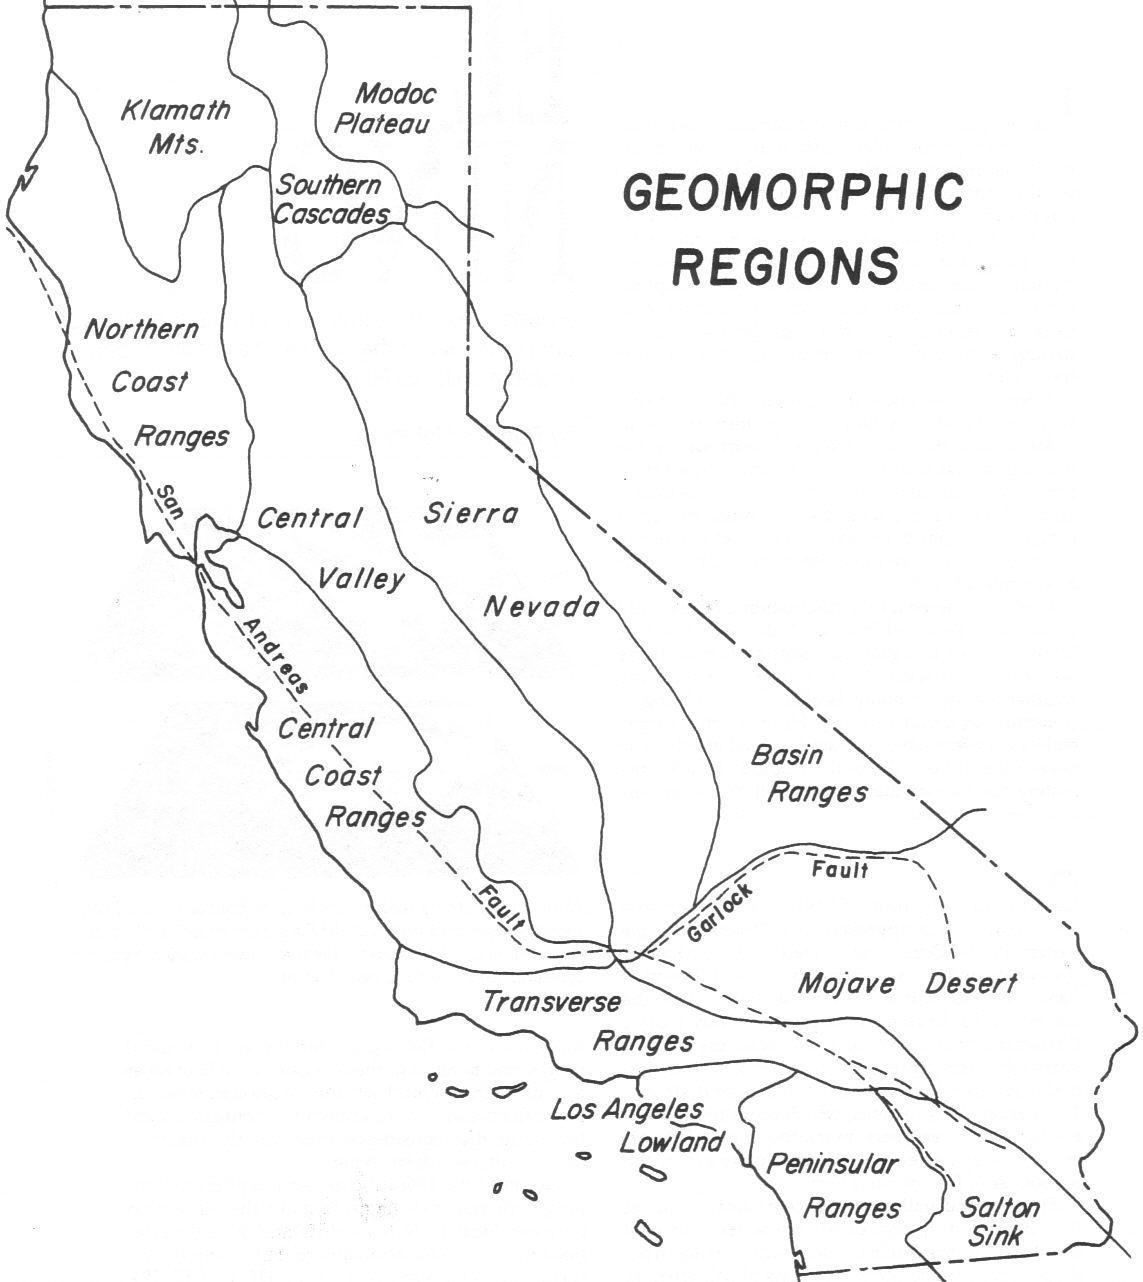 hight resolution of Geomographic regions of California   California map